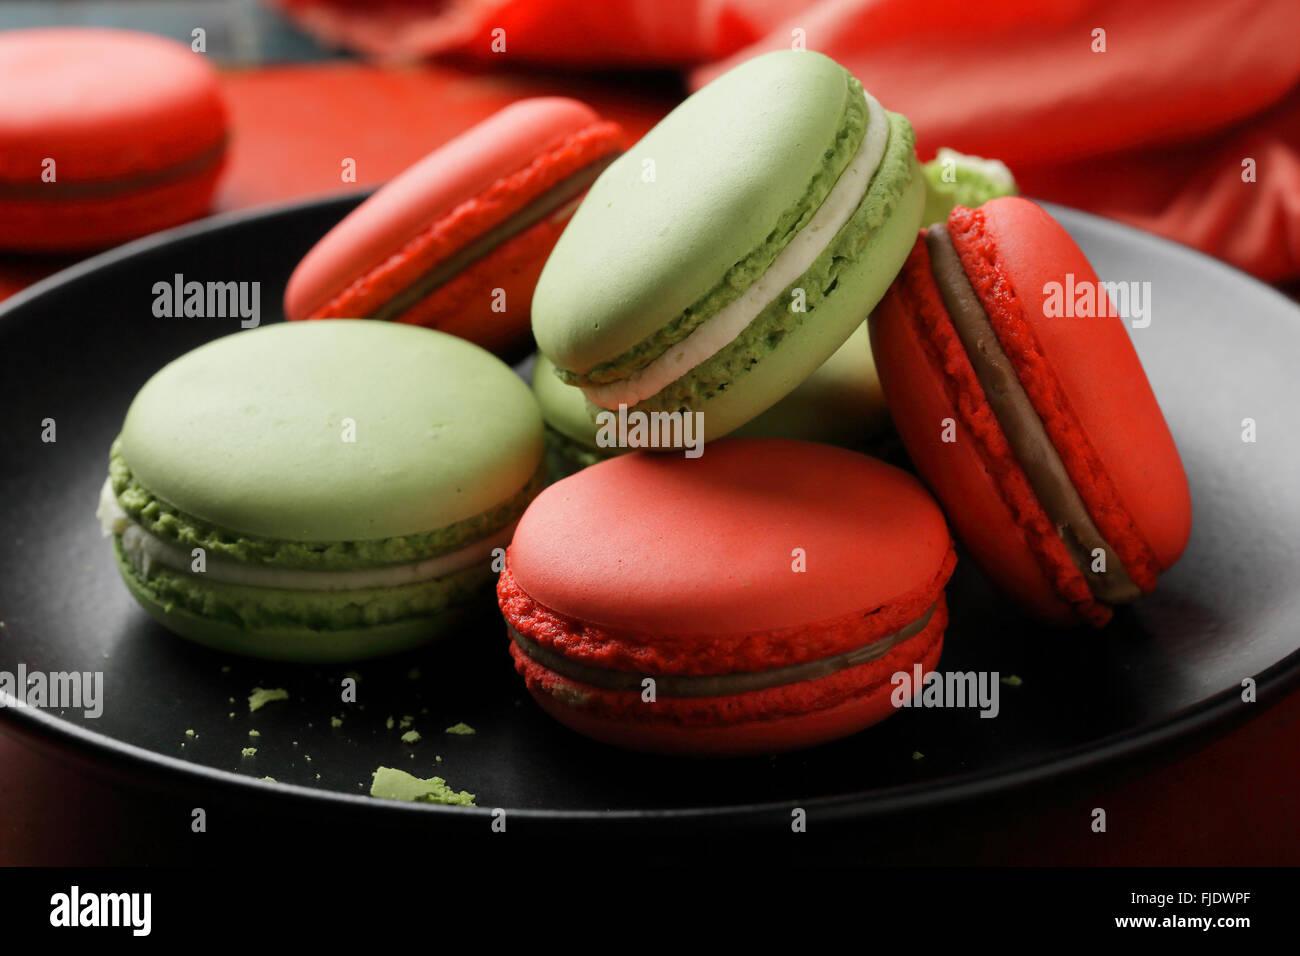 french macaroons closeup, food - Stock Image